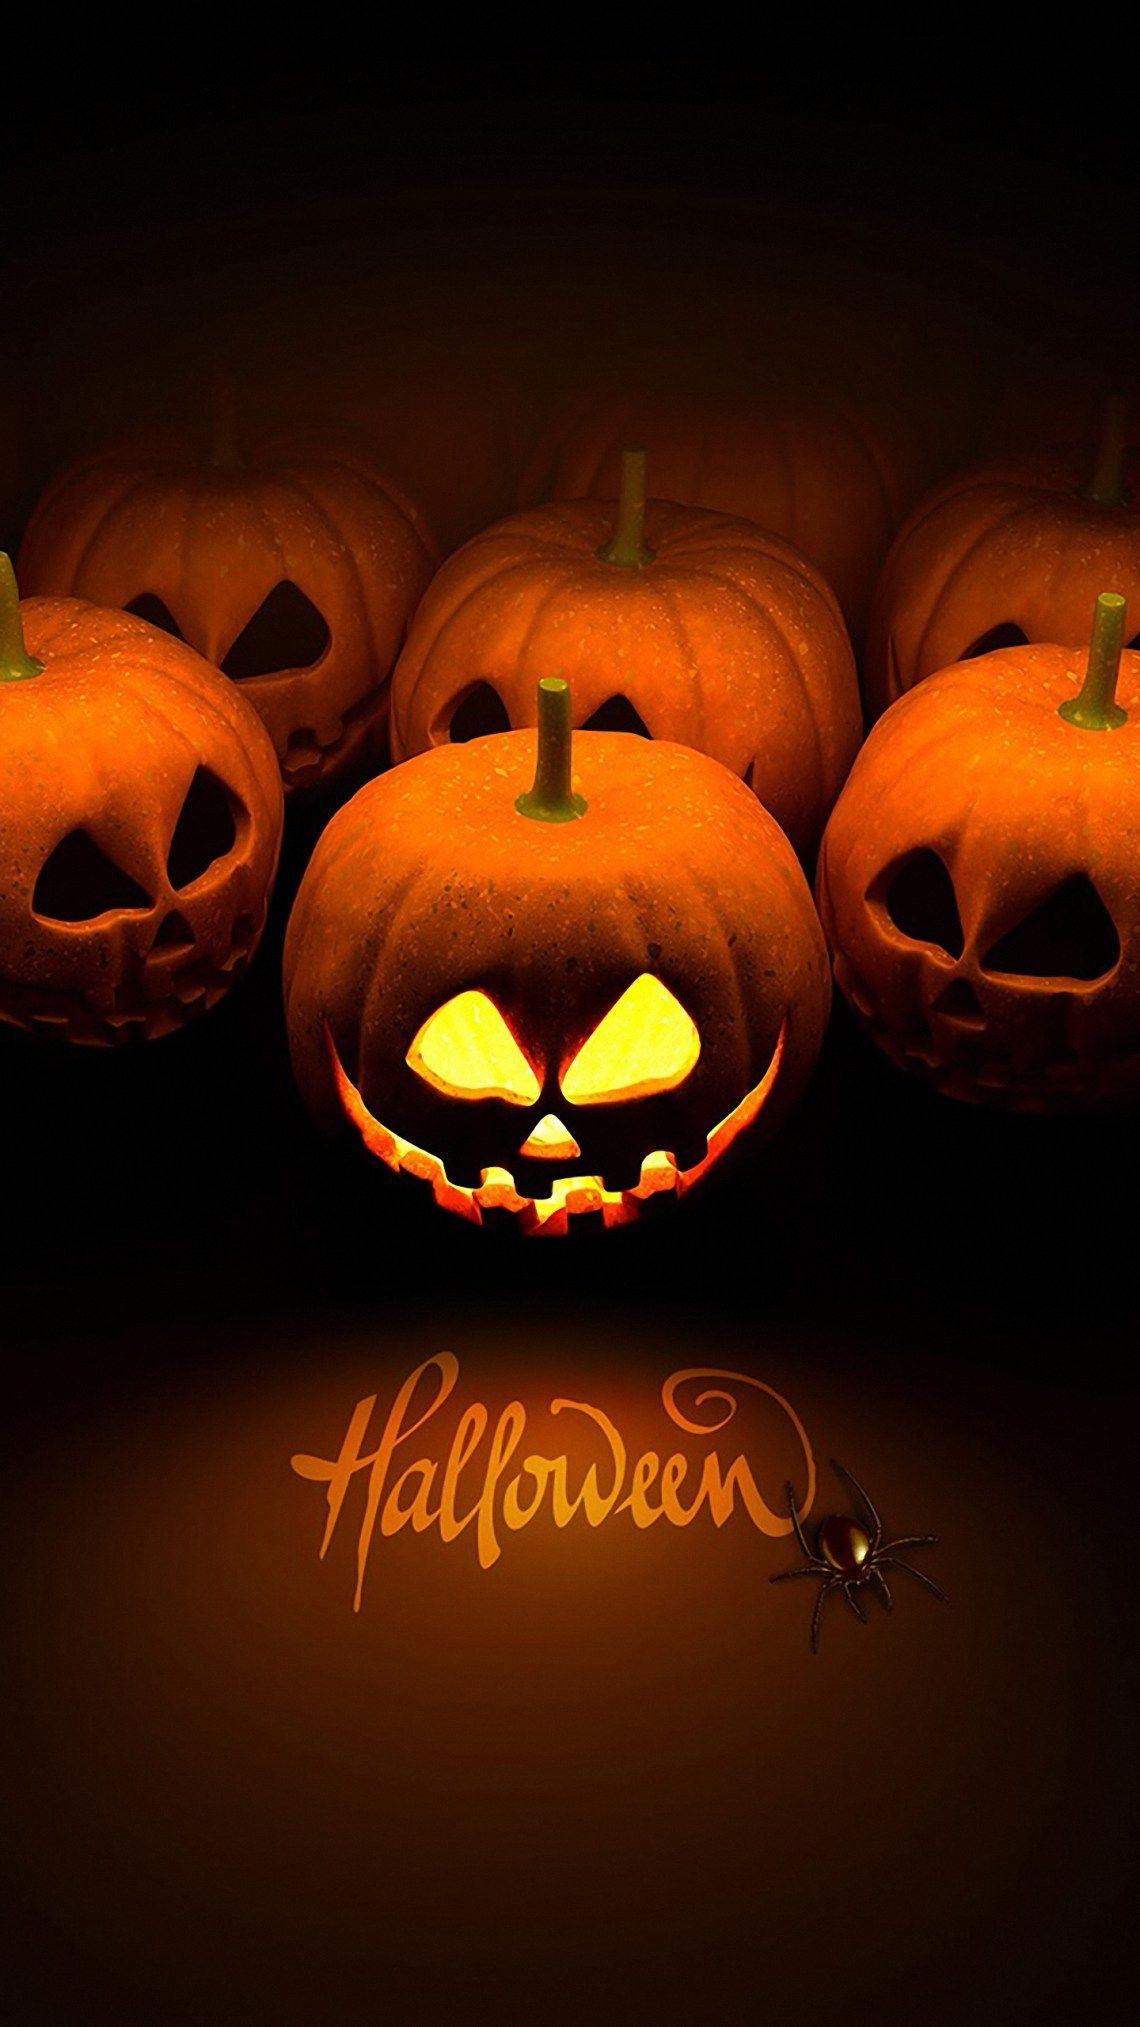 Halloween Hd Wallpaper Fondos De Halloween Fondo De Pantalla Halloween Ilustracion De Halloween